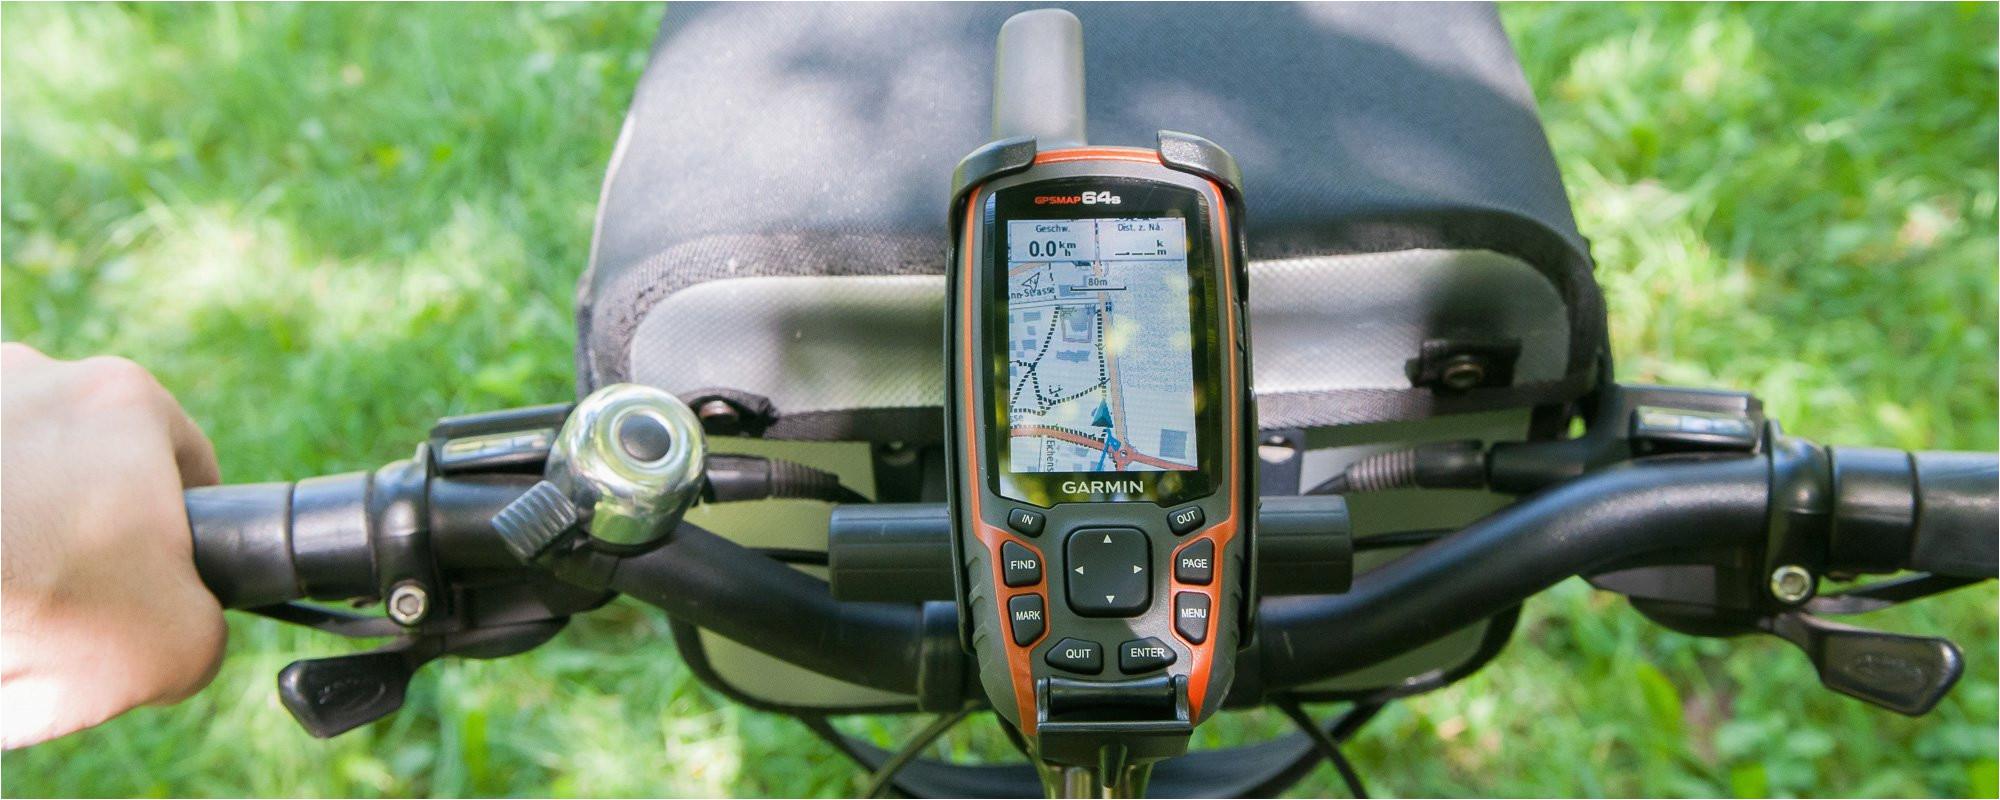 a garmin gpsmap 64s test robustes outdoor gps gerat